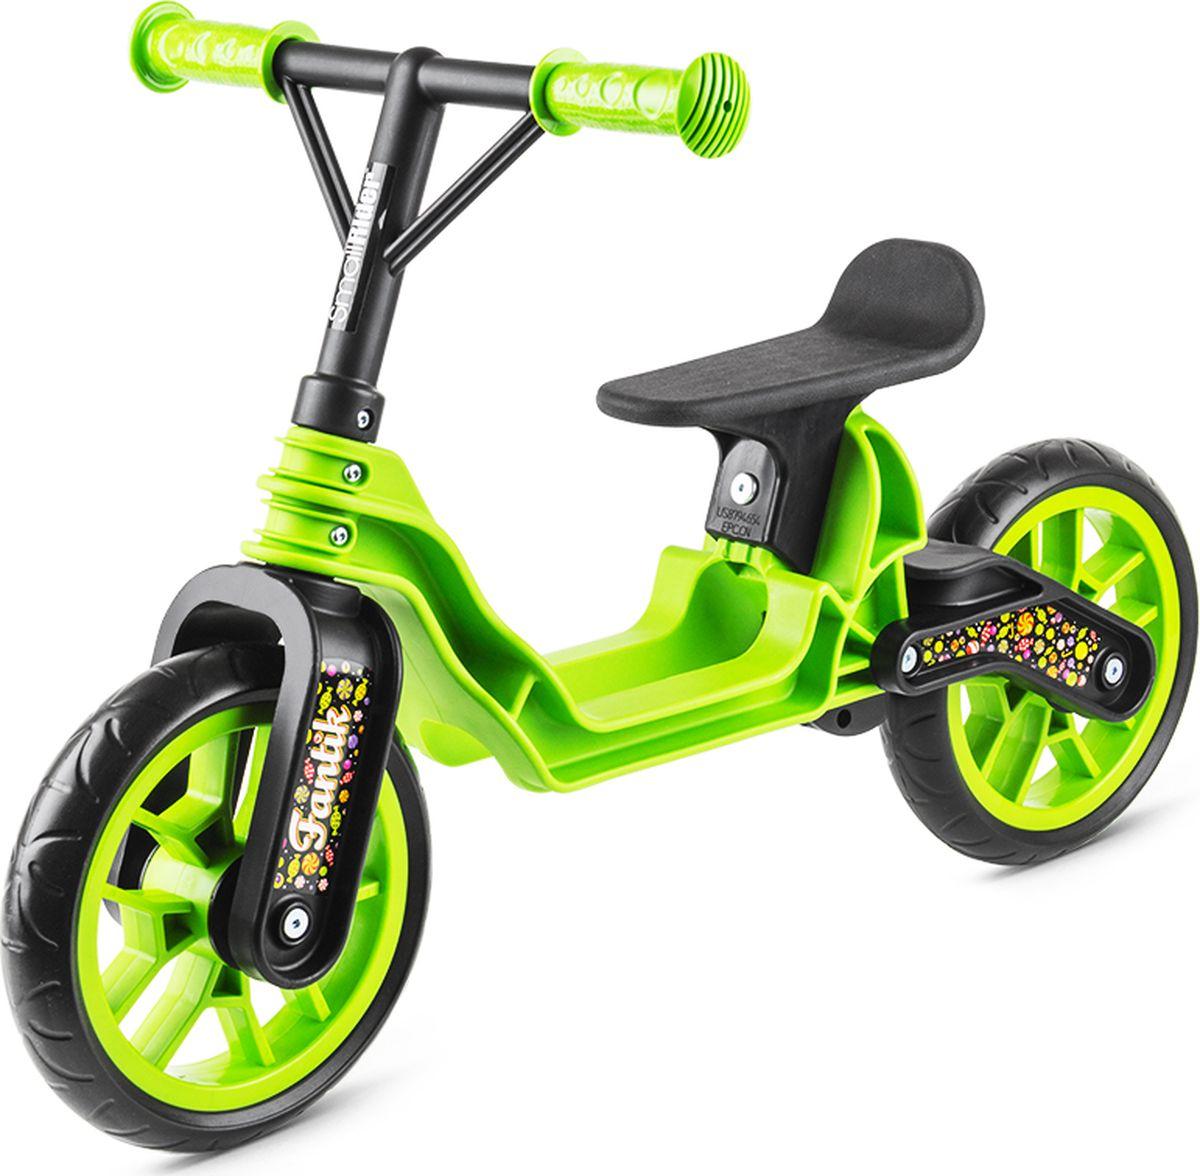 Small Rider Беговел детский Fantik цвет зеленый - Беговелы